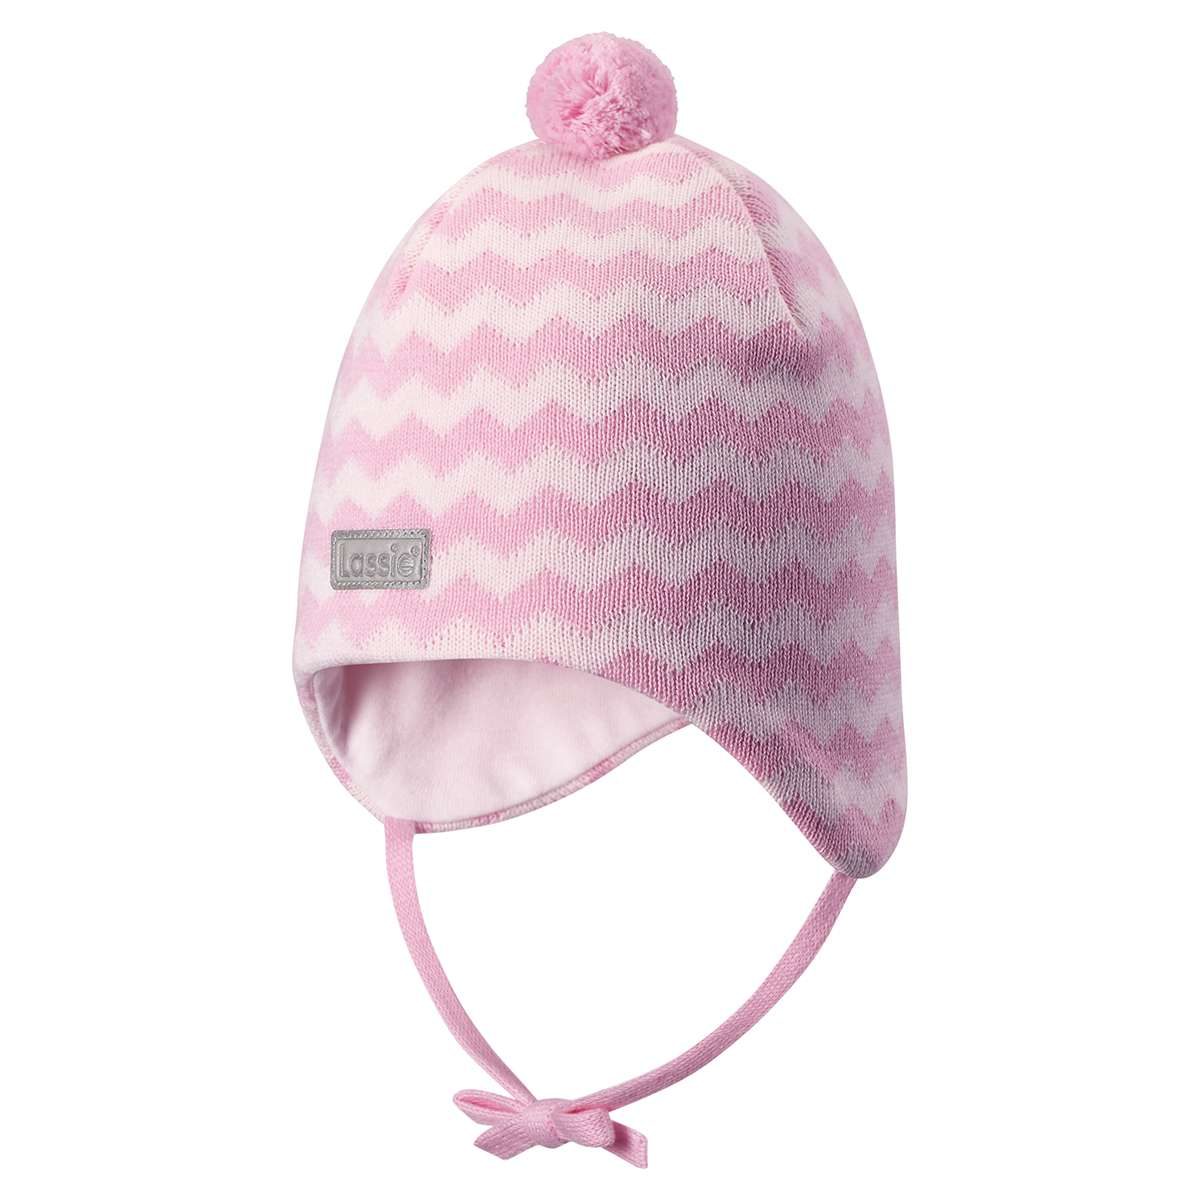 Lassie Baby Pink Bērnu kokvilnas cepure